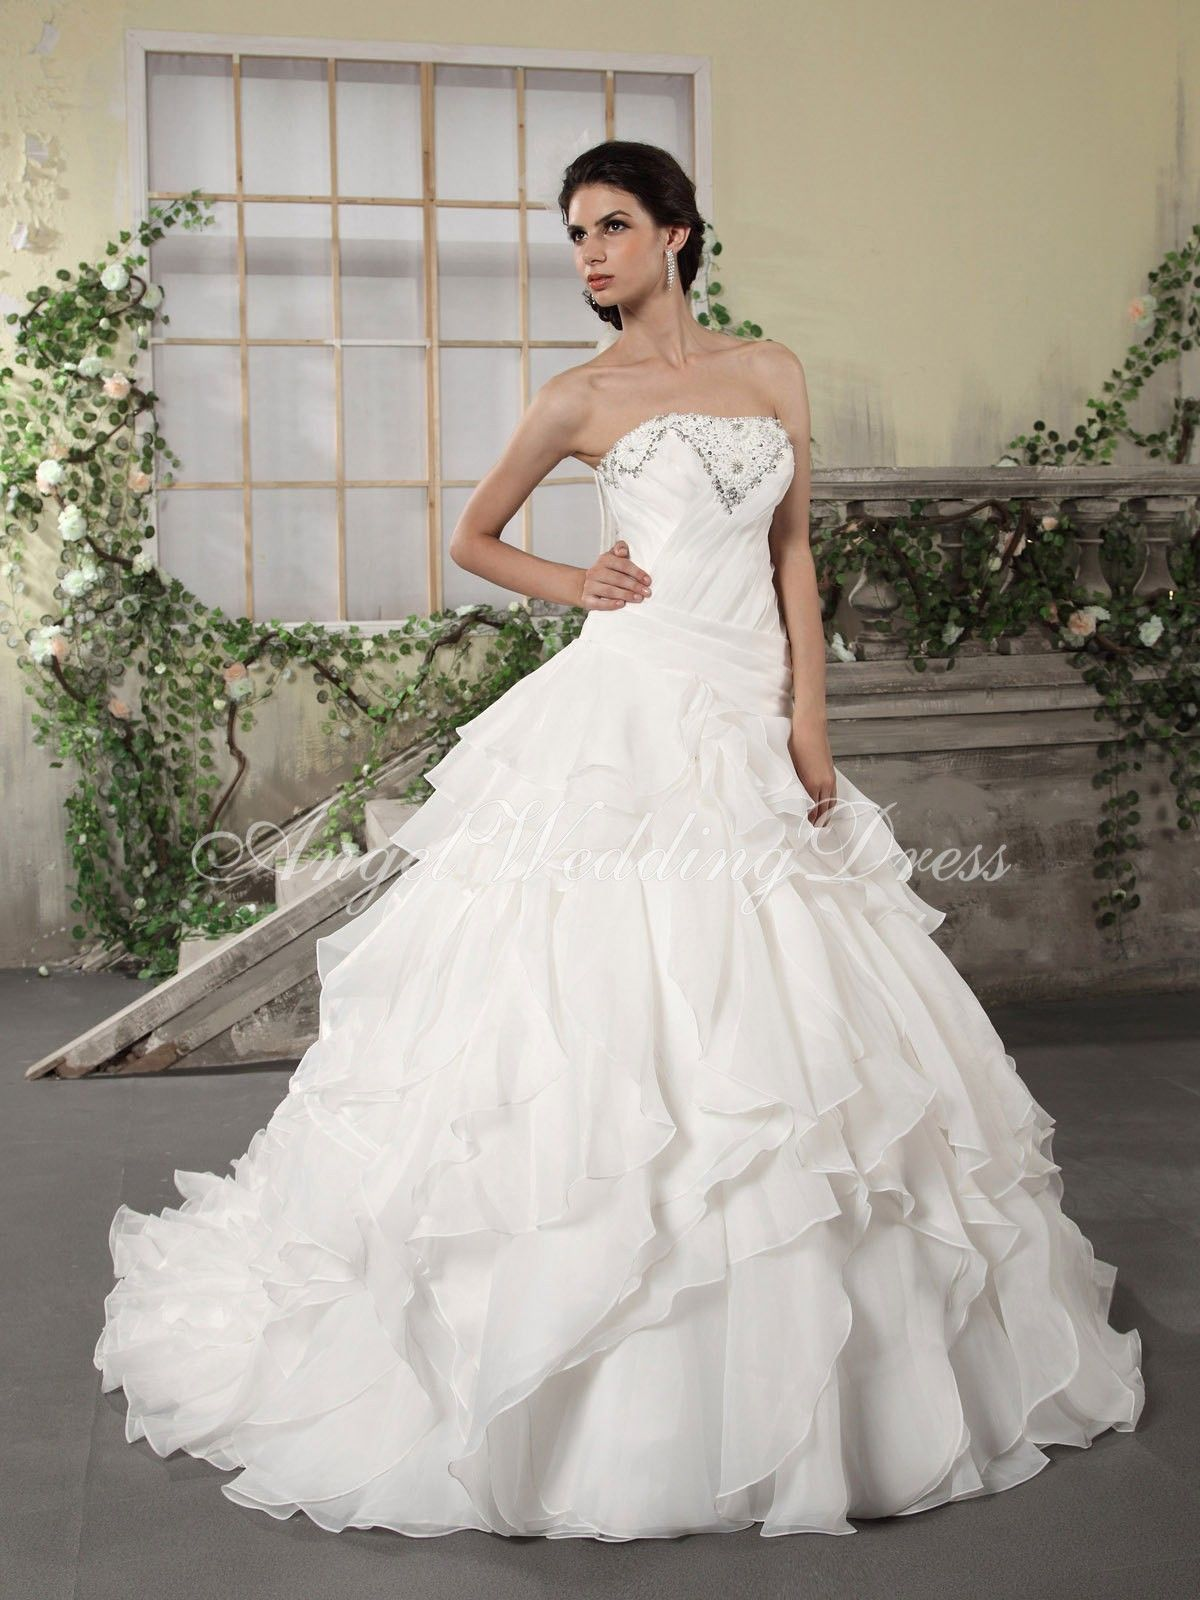 Wedding Dresses With Prices Weddingdress Pinterest Wedding